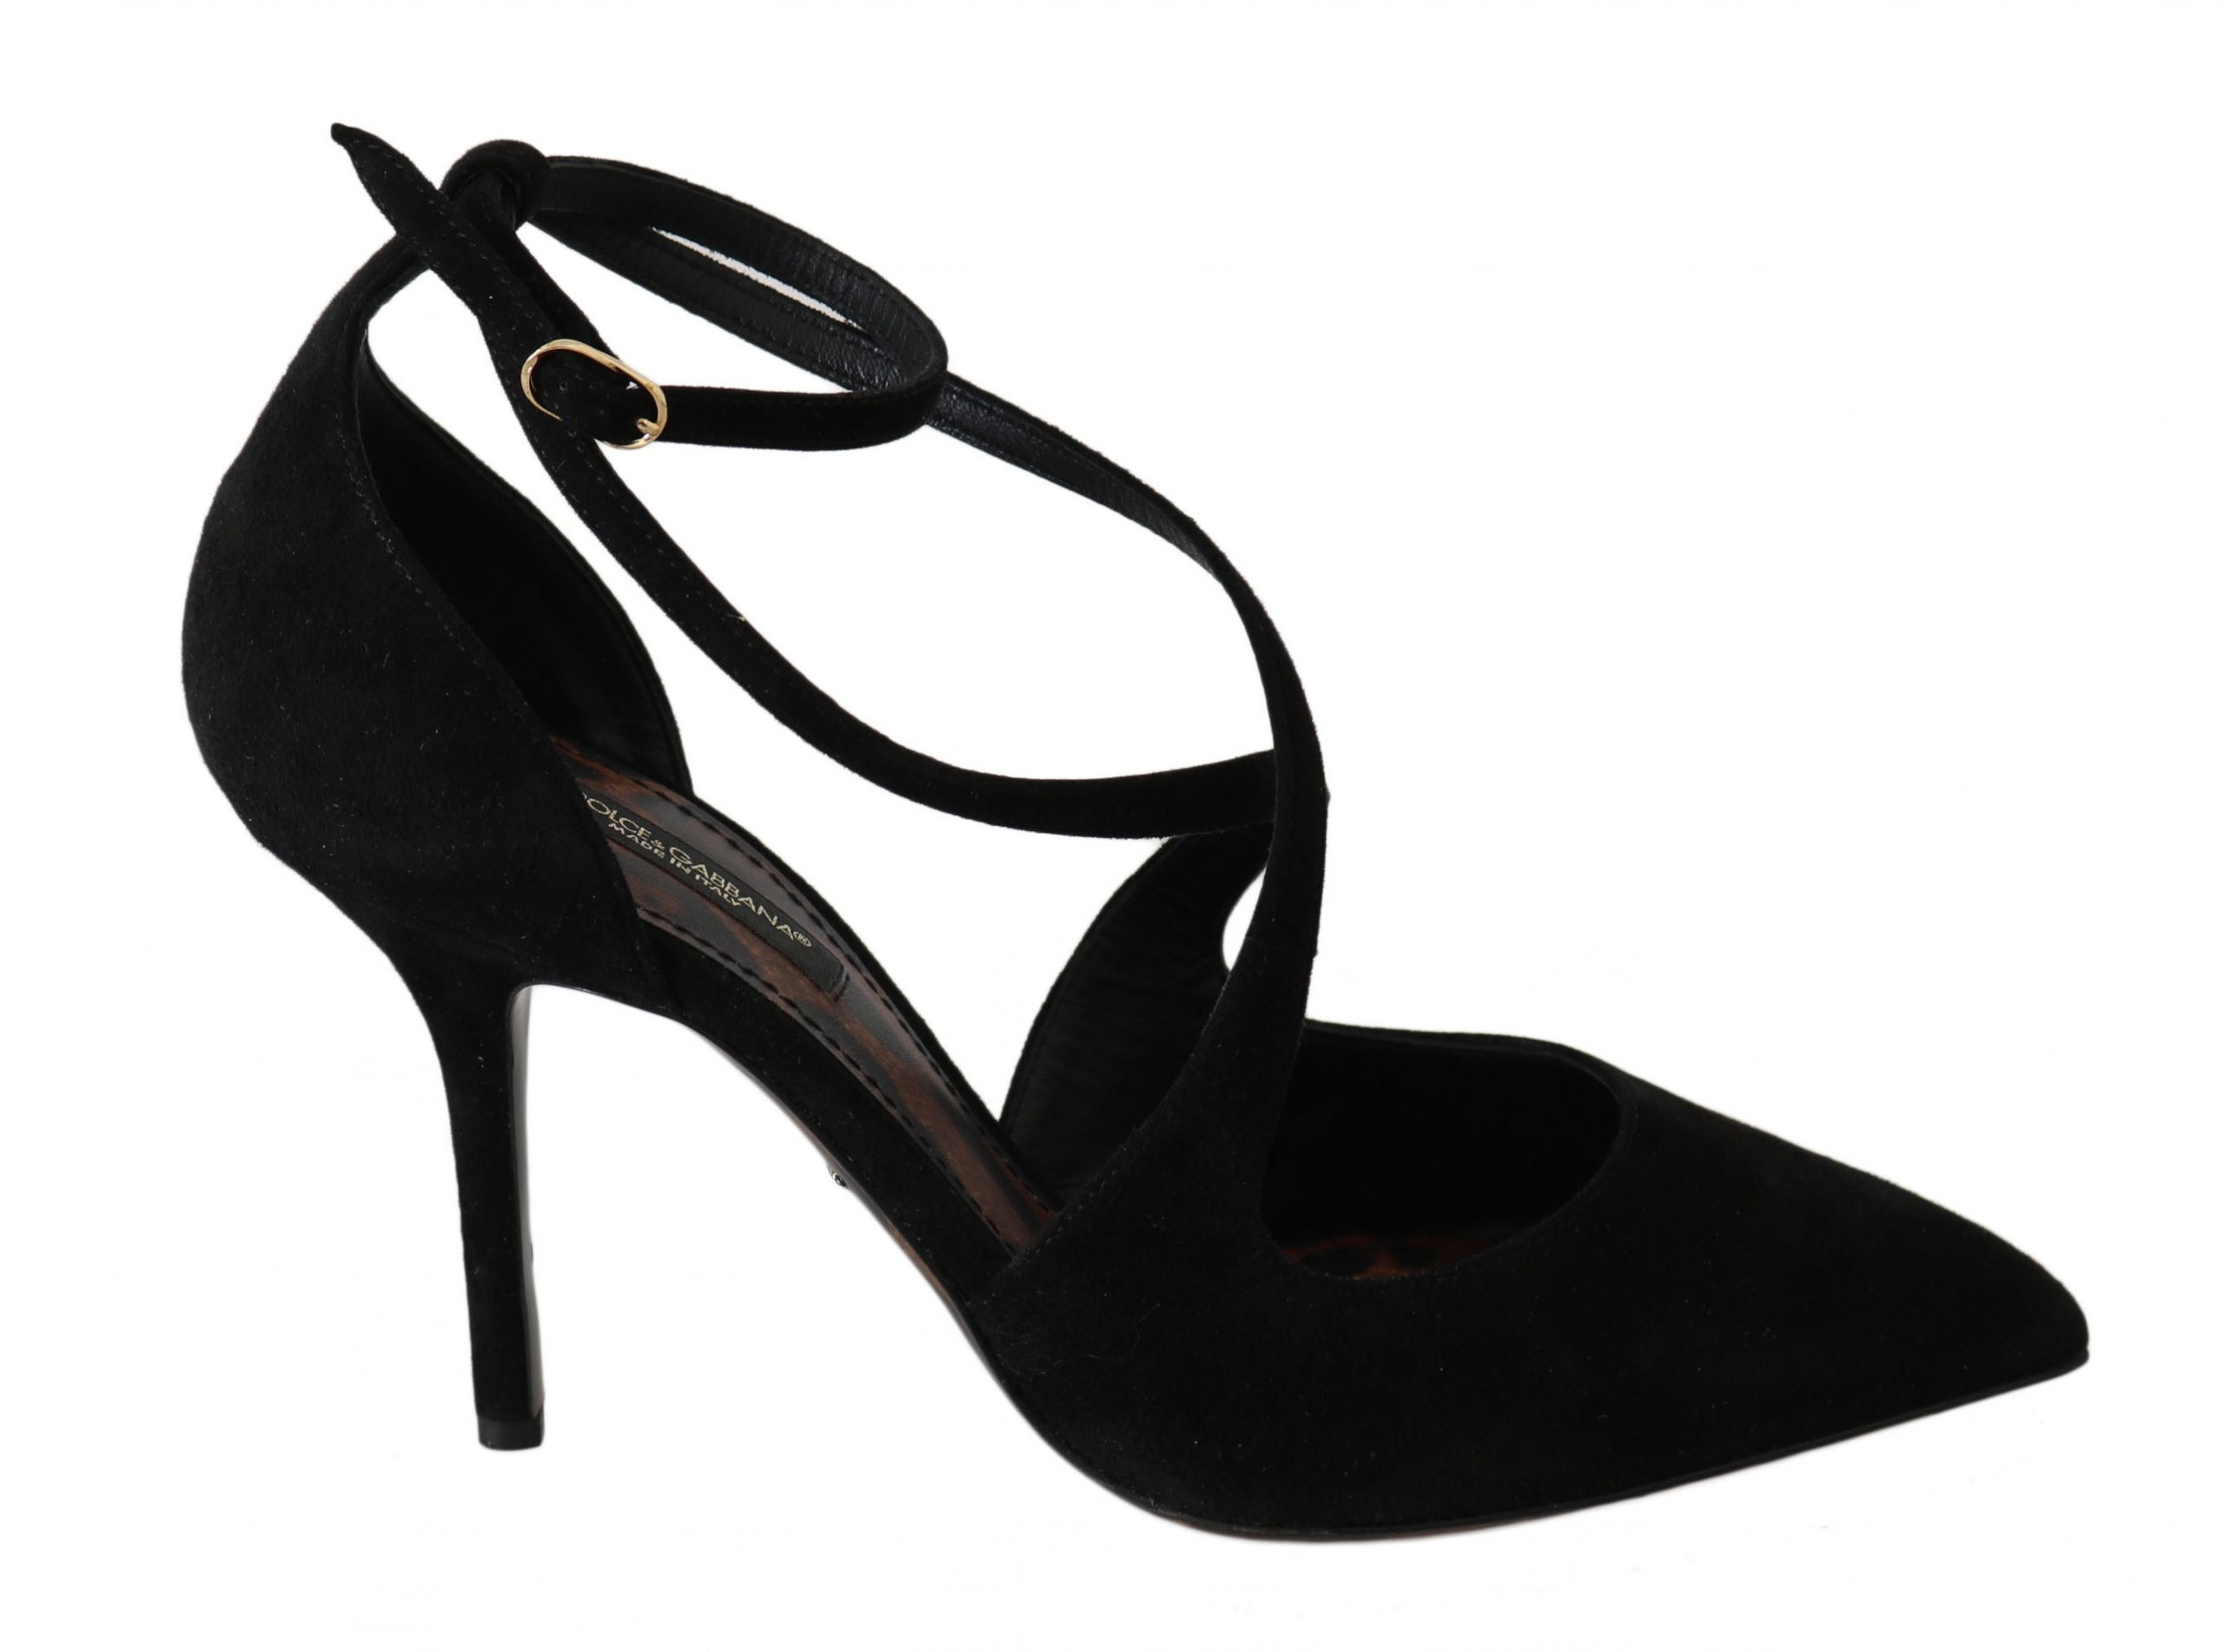 Dolce & Gabbana Women's Heels Shoes Black LA5970 - EU35.5/US5